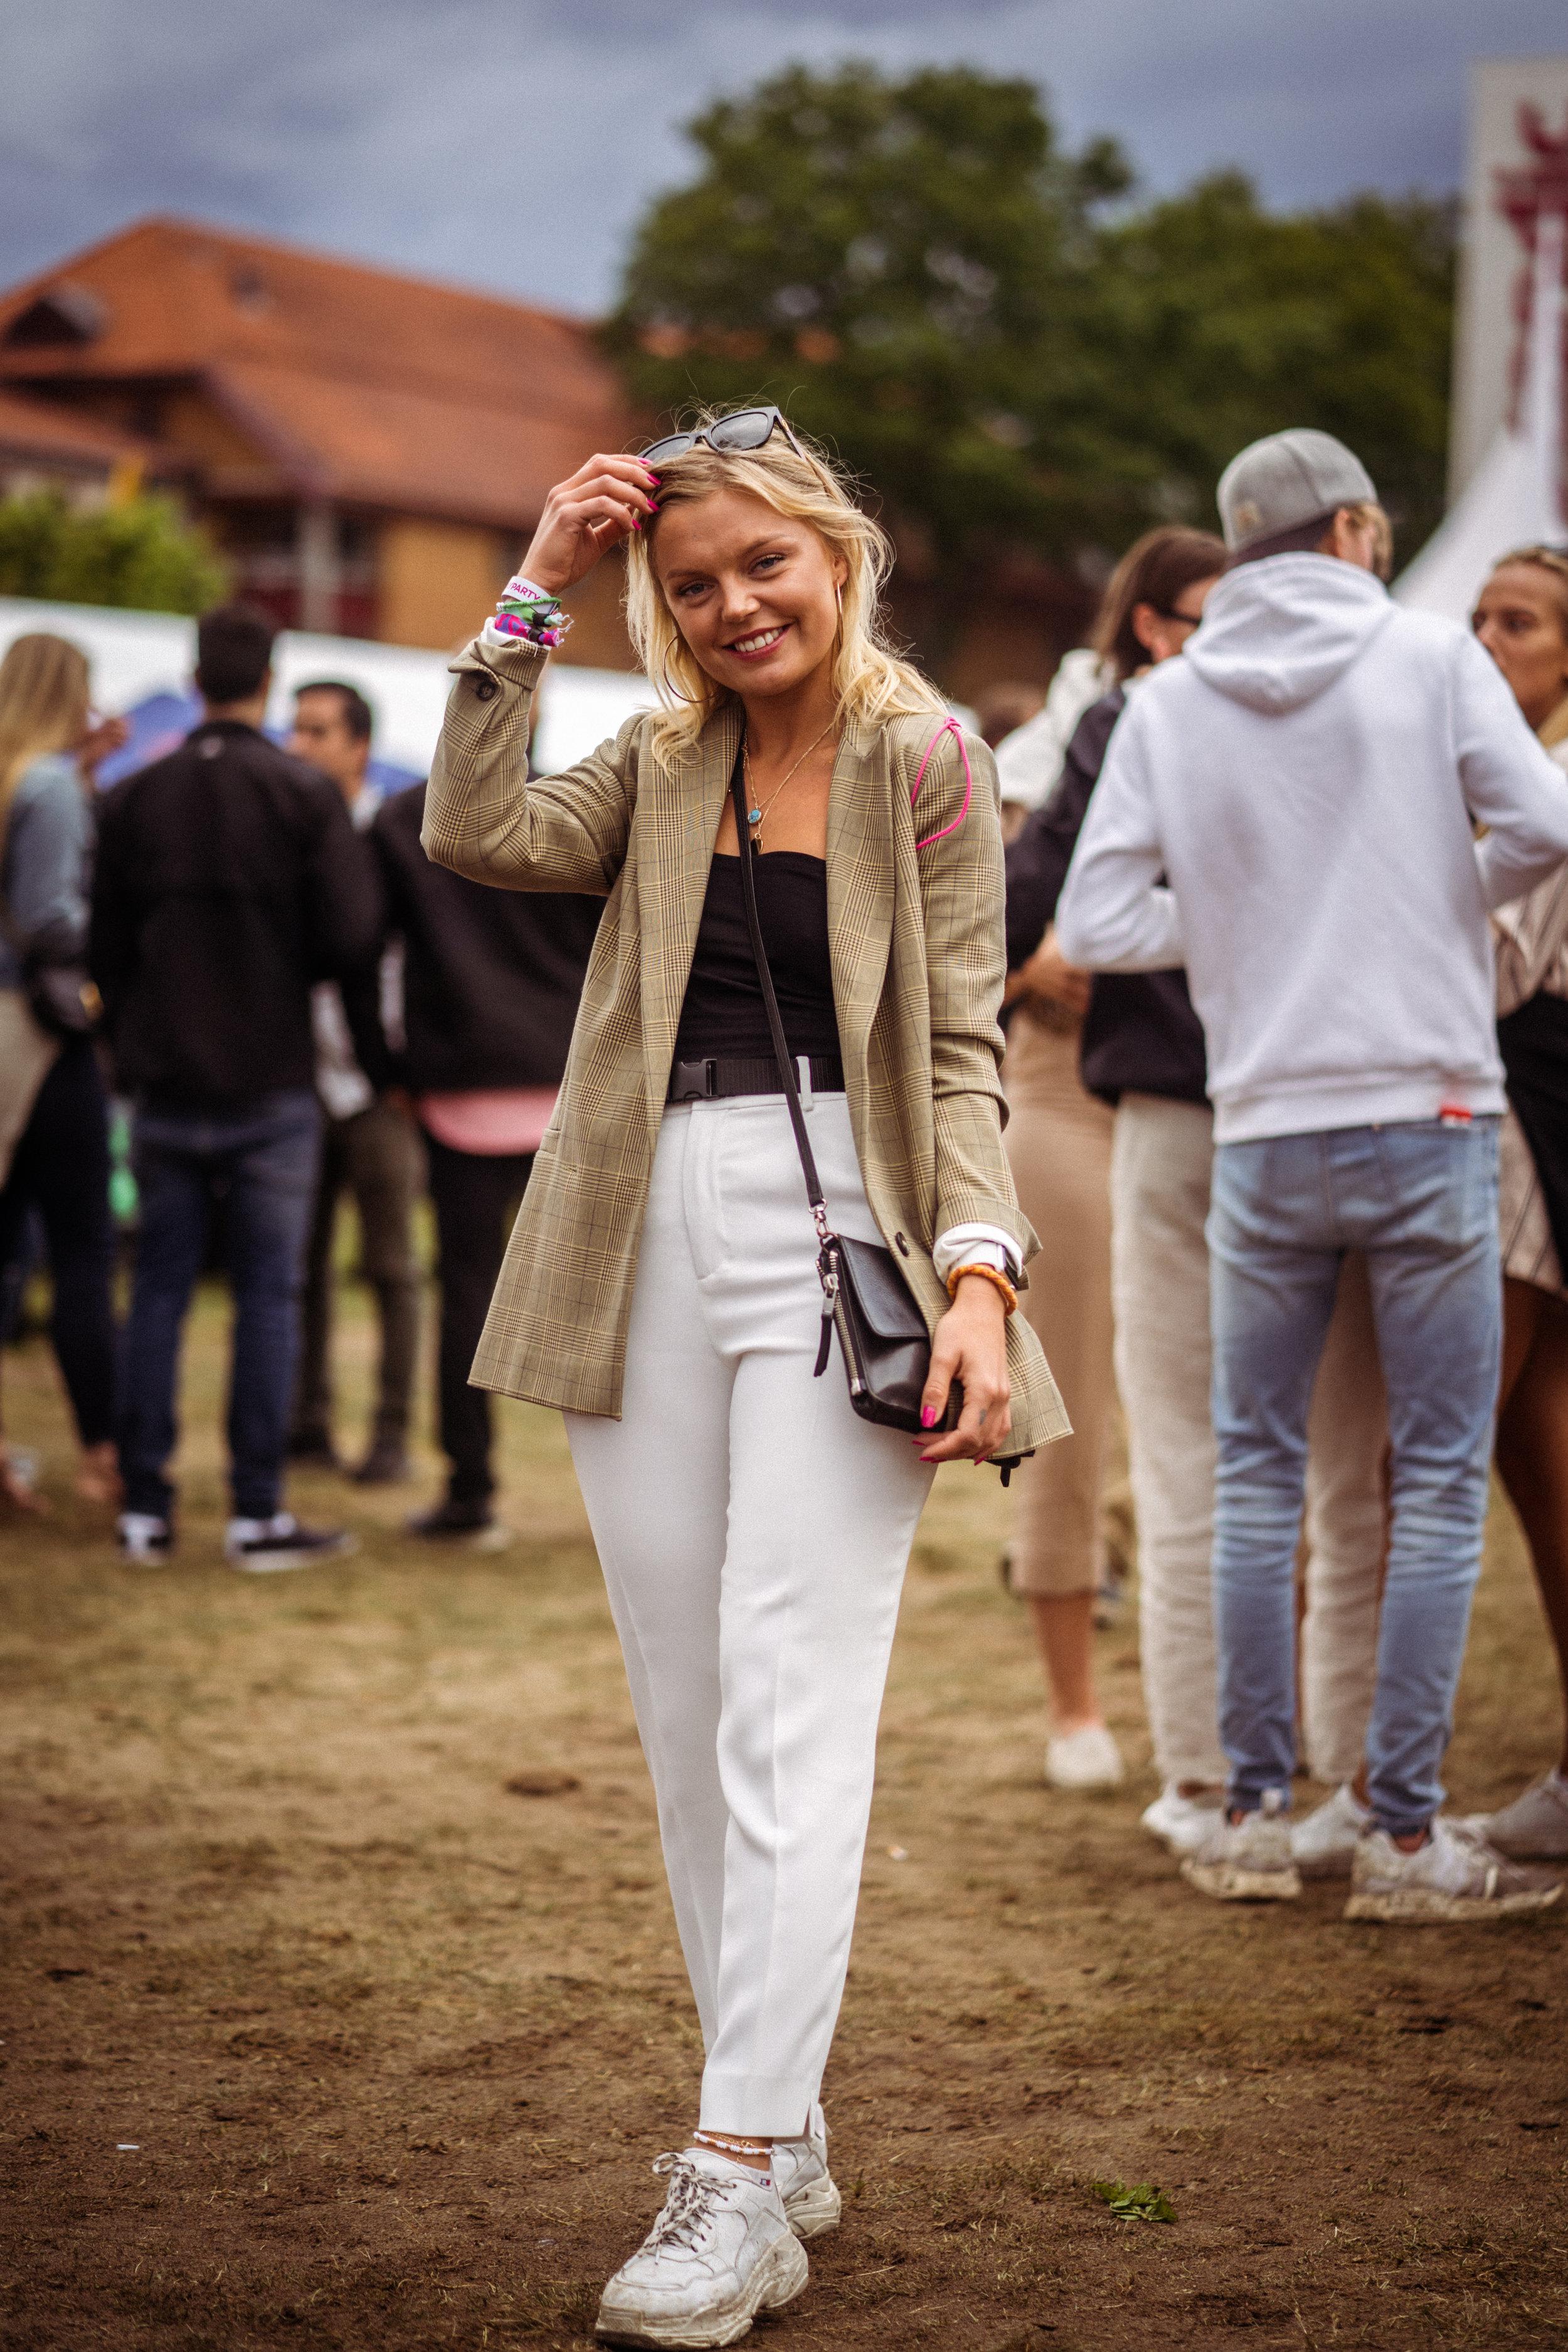 Kristina Kvalheim    taking the timeless blazer to the festival. Photo: Sander Berhus / Estér Magazine.